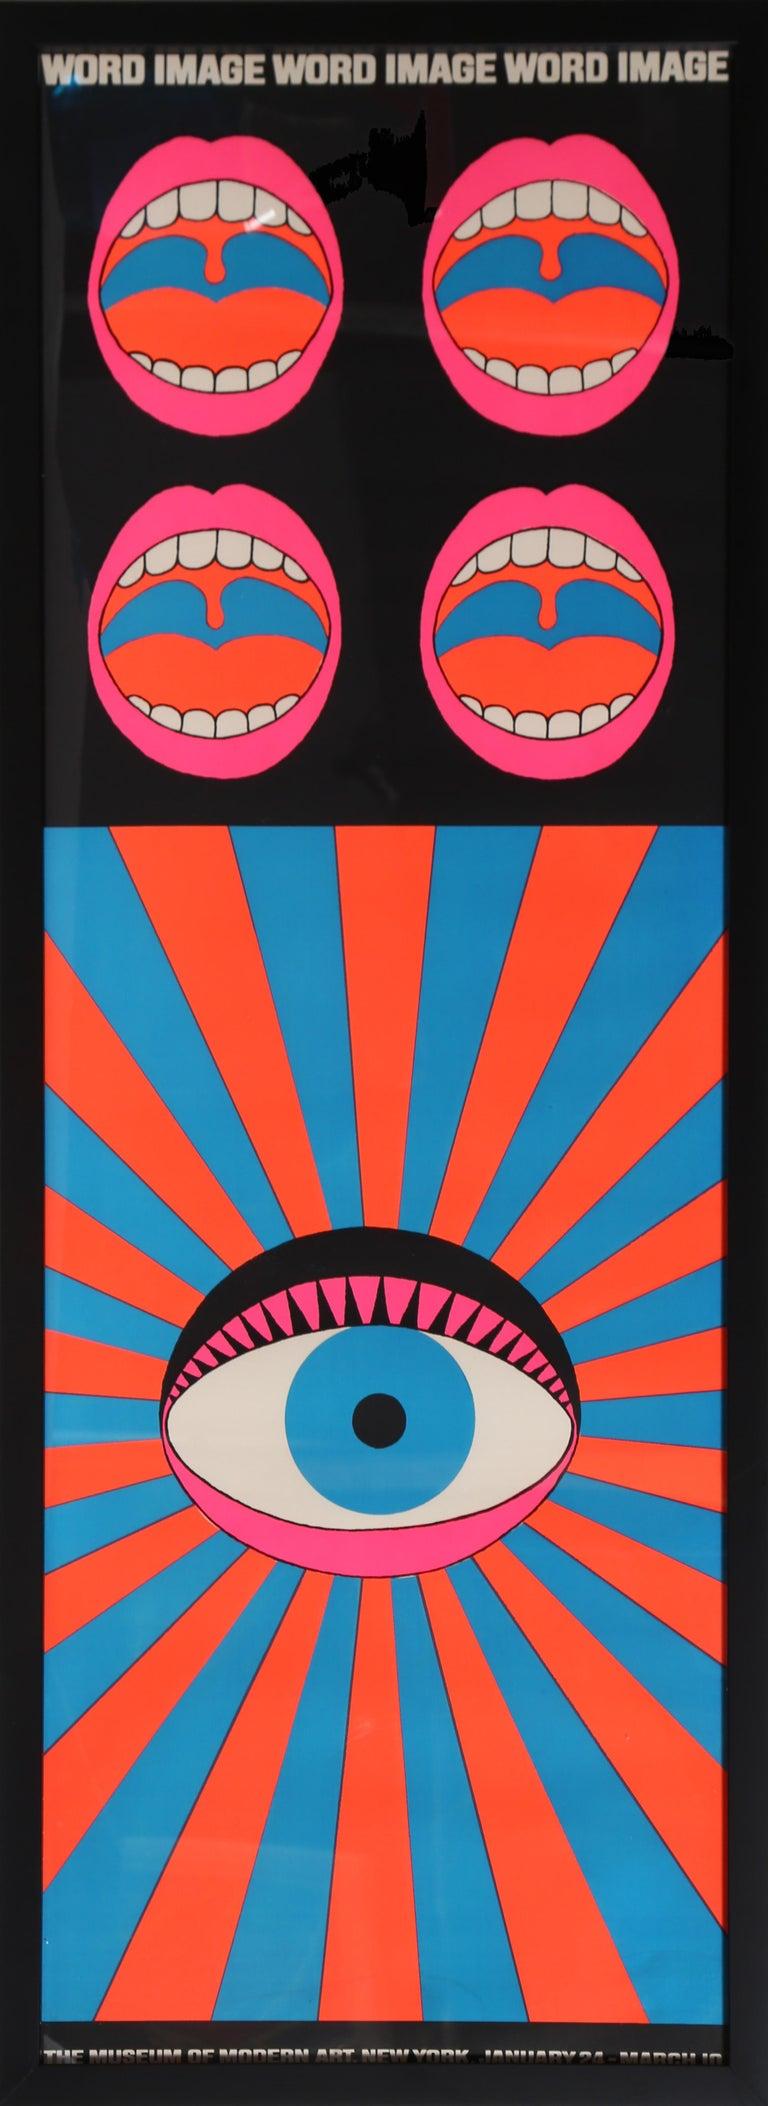 Artist: Tadanori Yokoo, Japanese (1936 - ) Title: Word and Image Year: 1968 Medium: Silkscreen Poster Size: 48 x 17.25 in. (125.73 x 43.815 cm) Frame: 49.5 x 18.5 inches